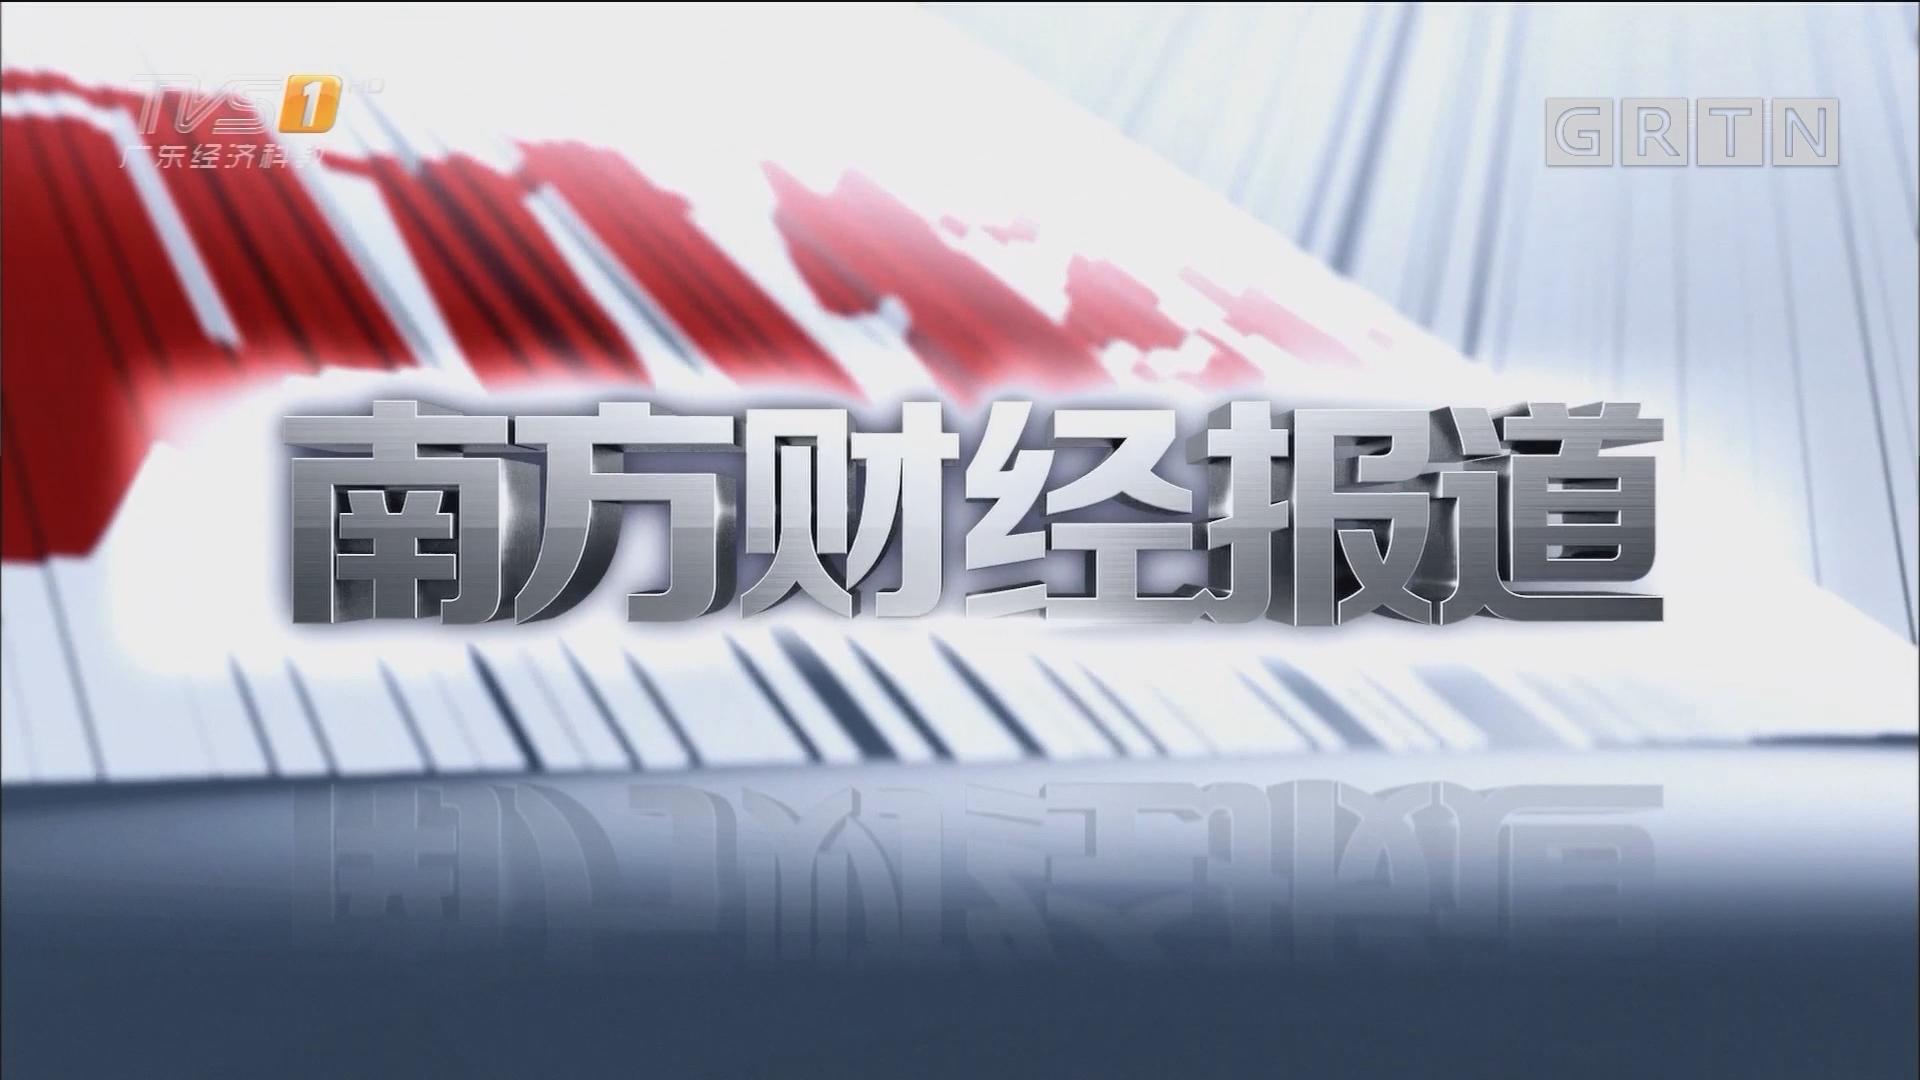 [HD][2018-03-07]南方财经报道:广东代表团举行全体会议并向中外媒体开放 李希马兴瑞等回答记者提问